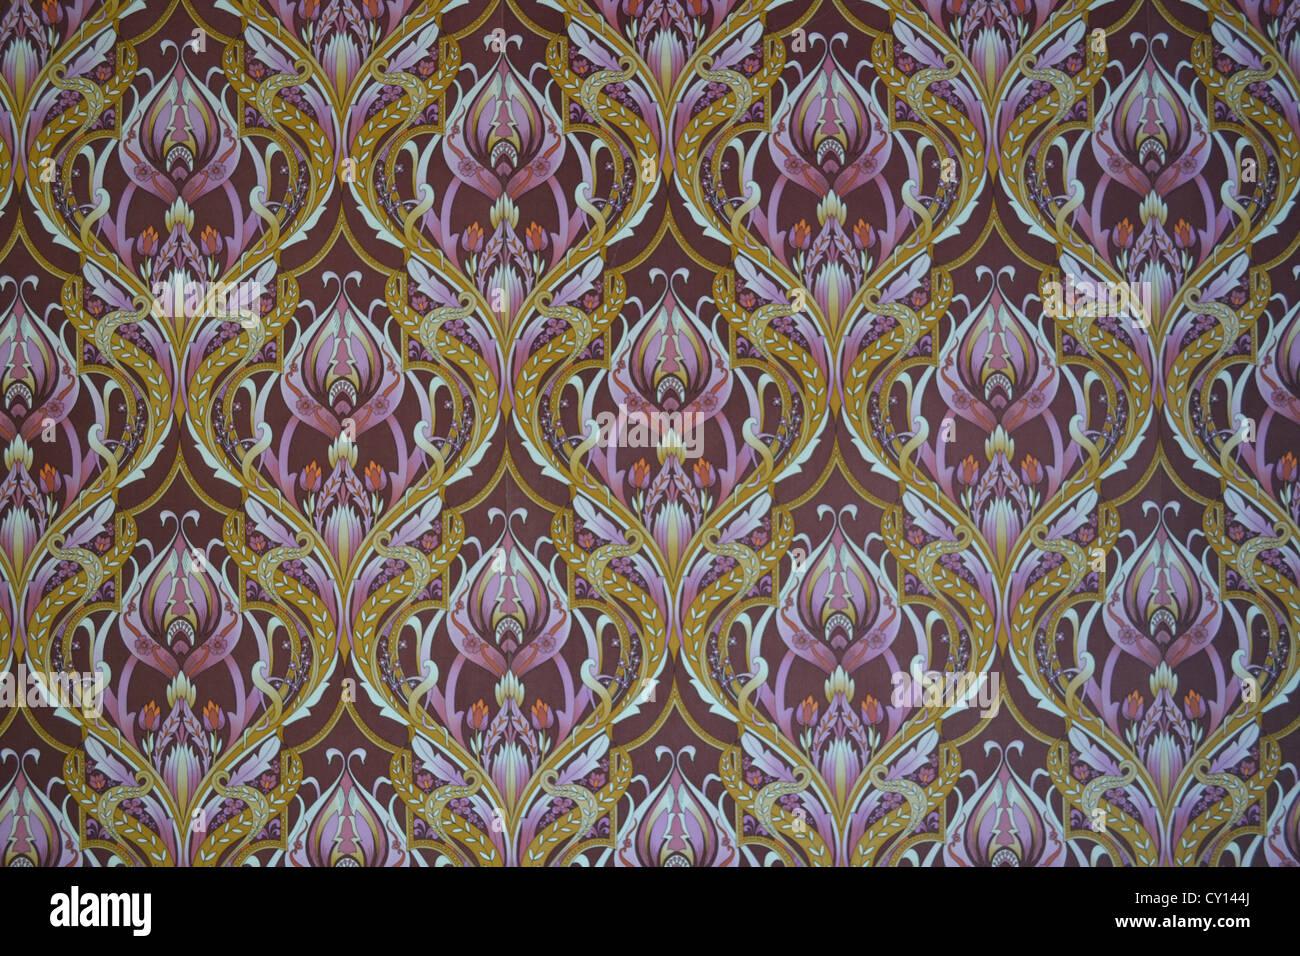 1960s original vintage wallpaper pattern - Stock Image